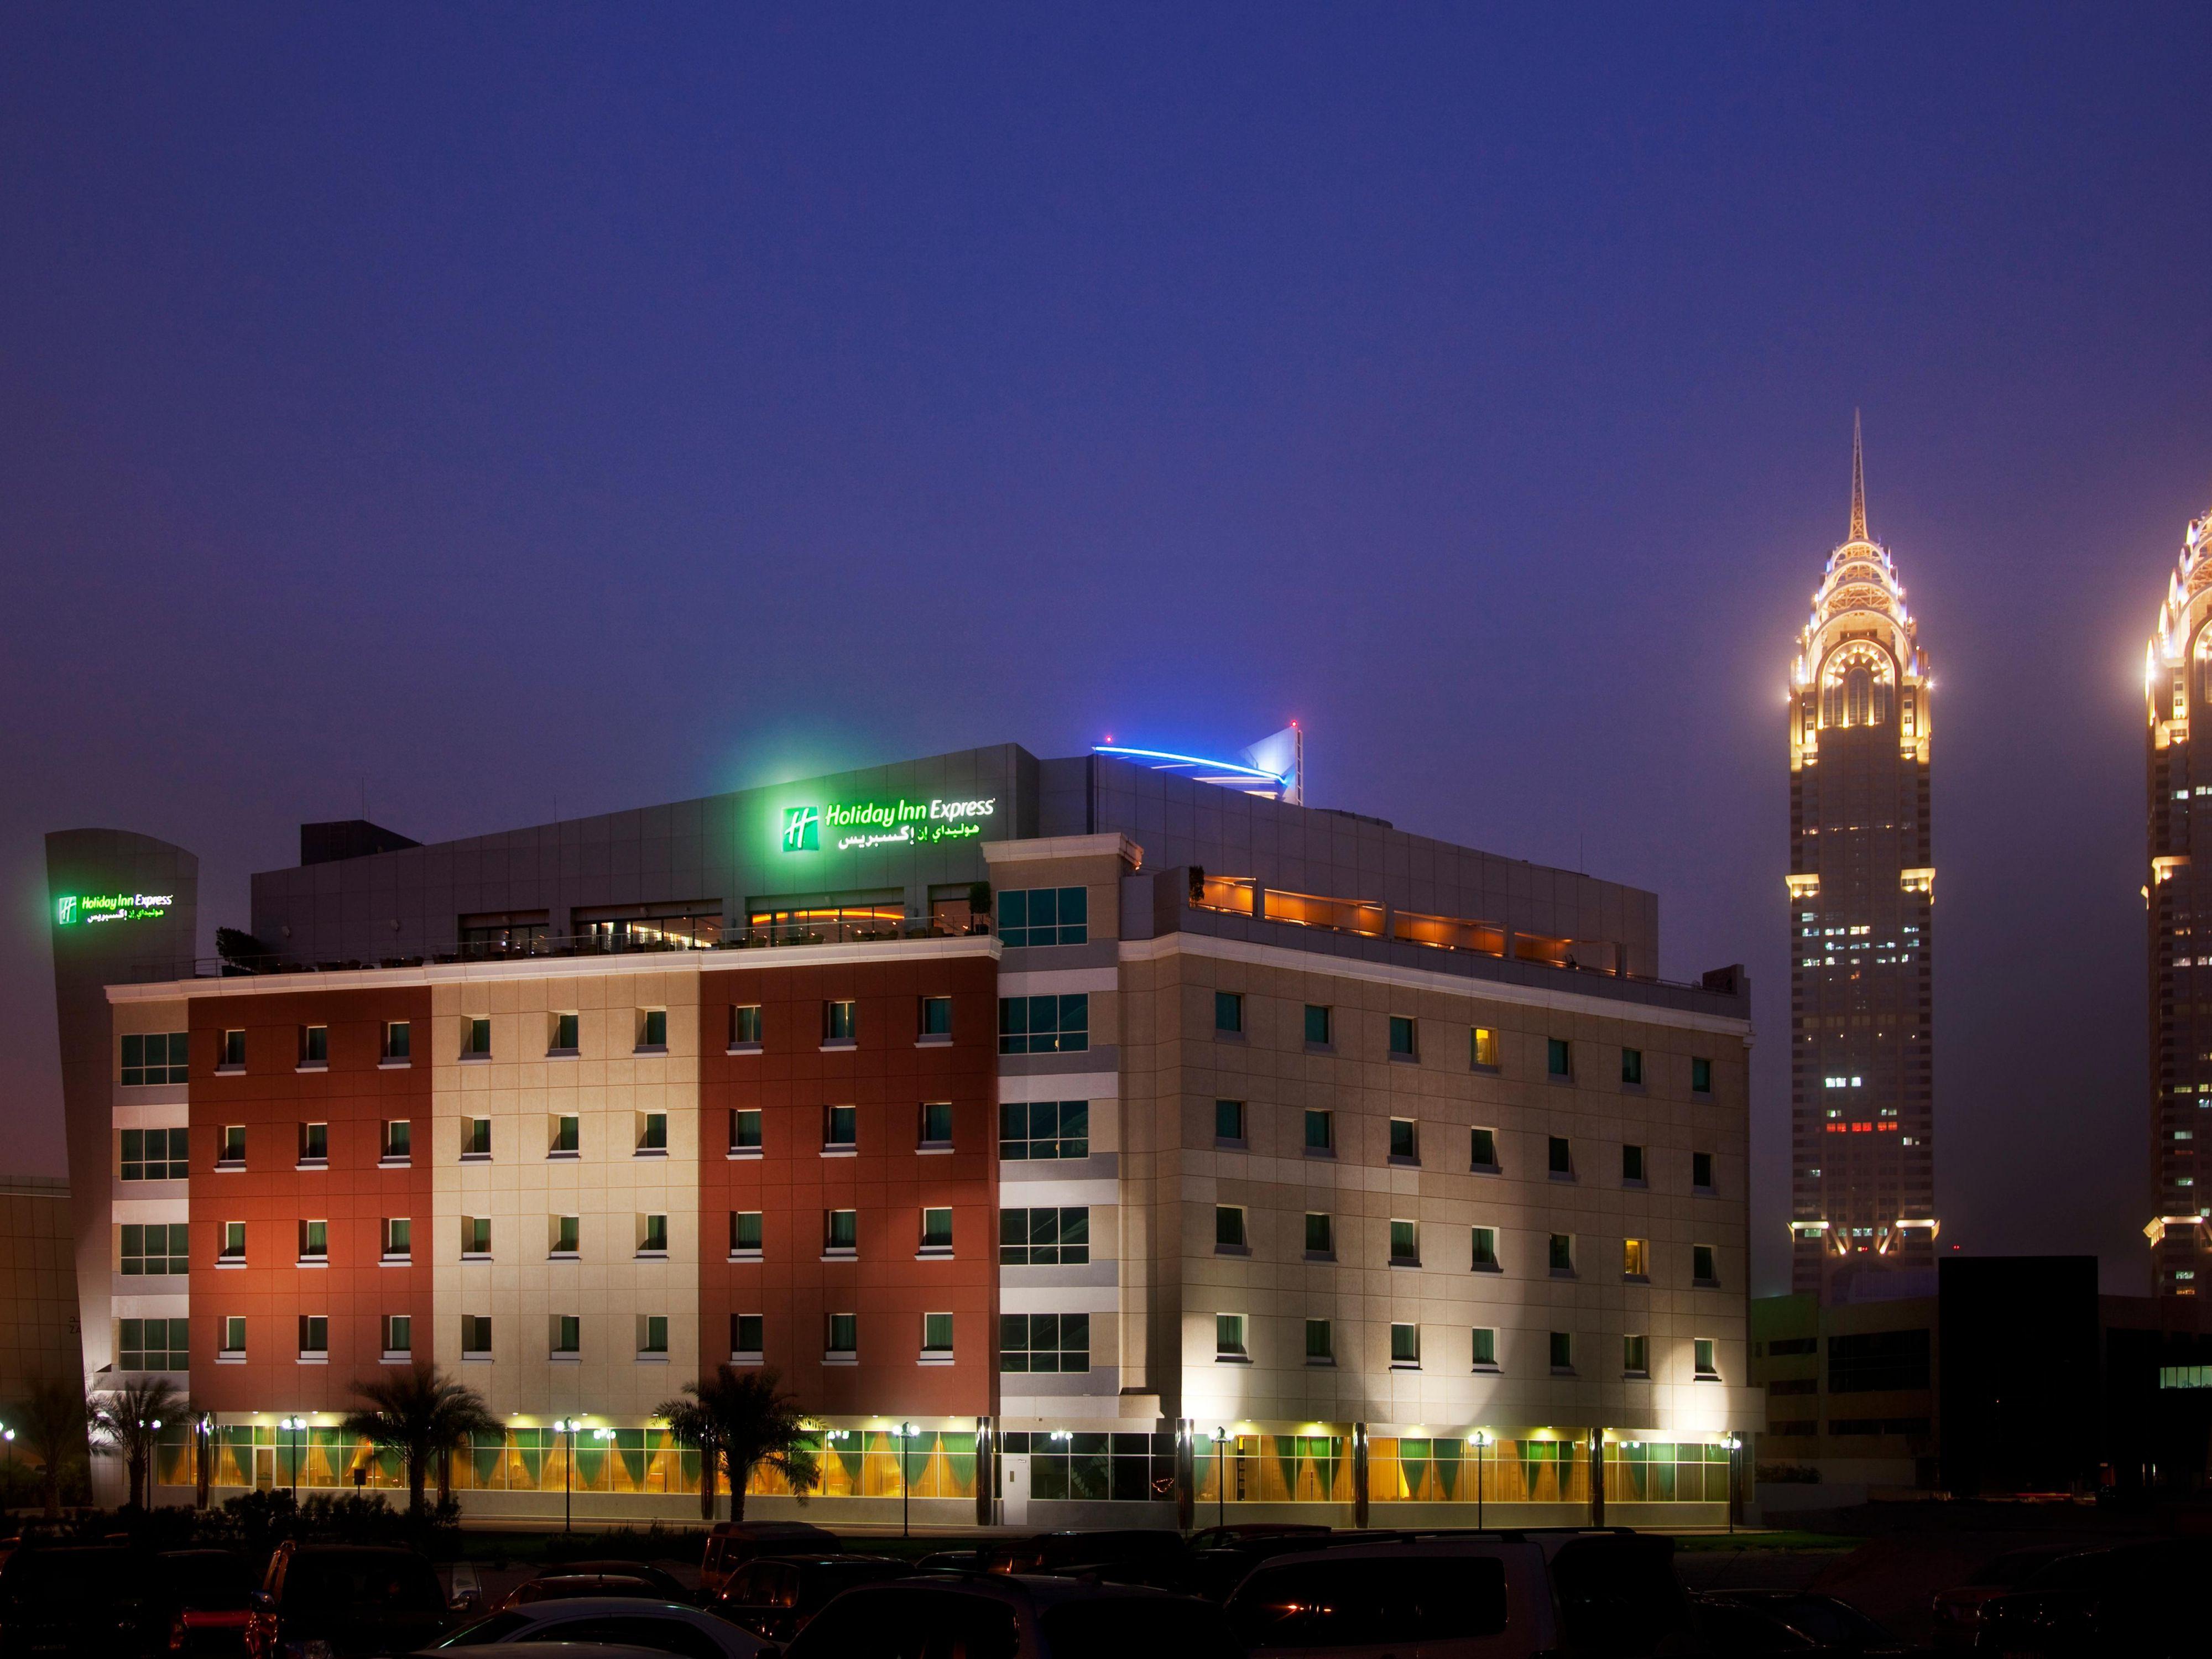 Hotels Near Dubai Marina In Dubai United Arab Emirates - 26 amazing photos that will make you want to visit dubai